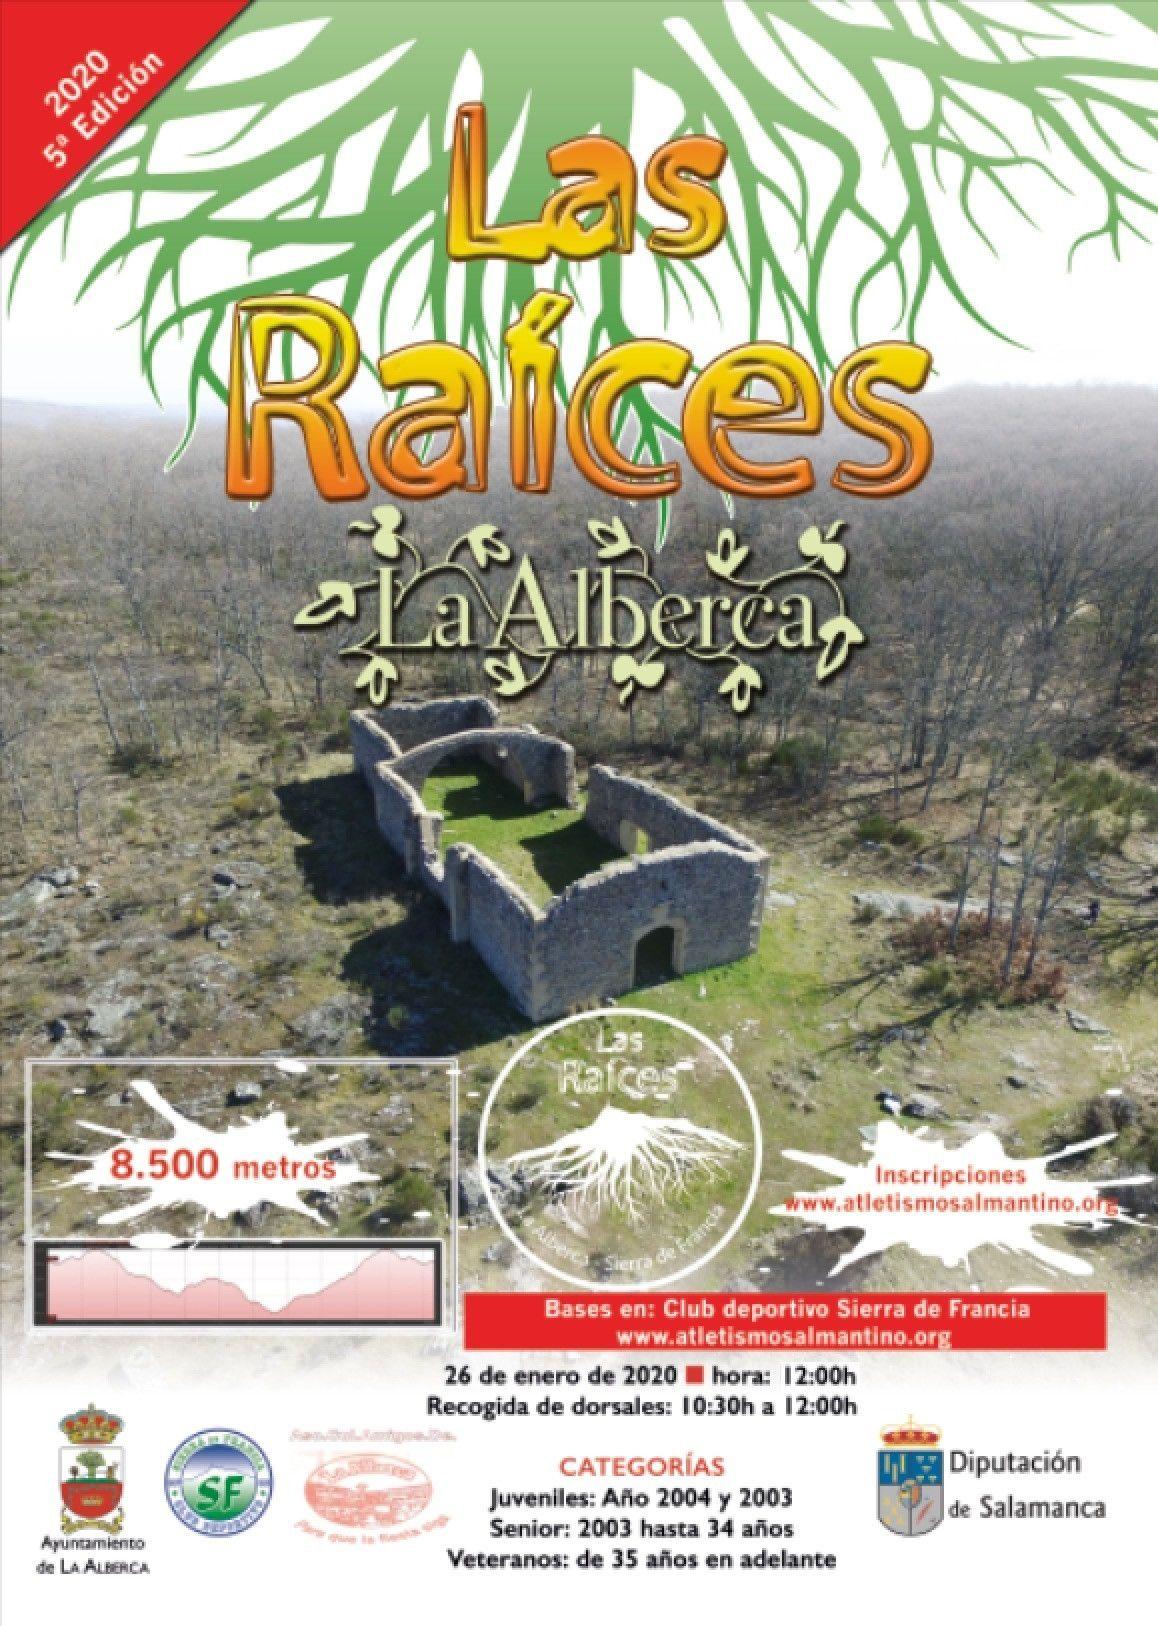 Carrera de Las Rau00edces